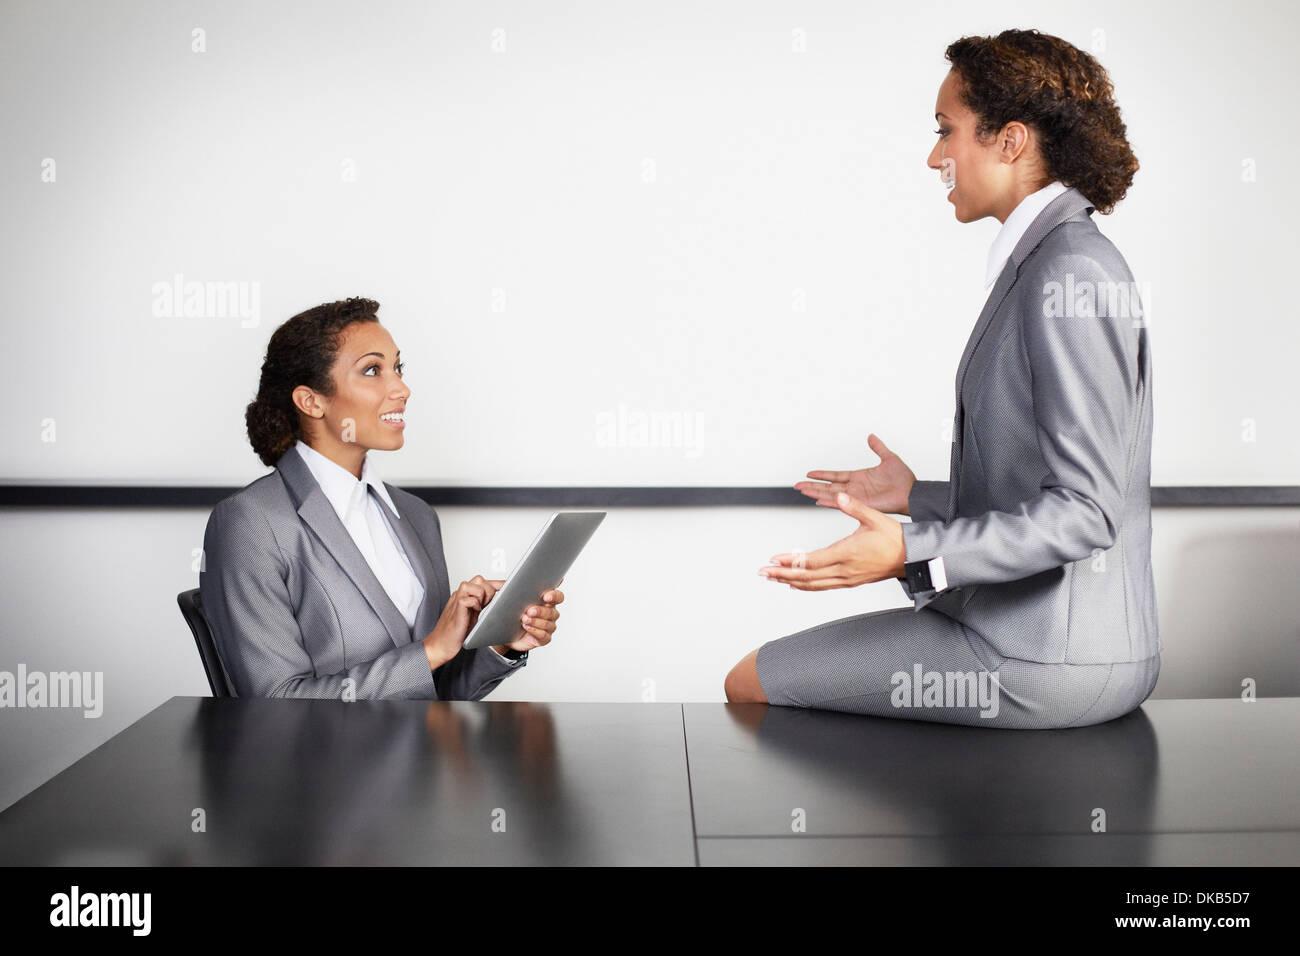 Imprenditrici in ufficio, immagini multiple Immagini Stock